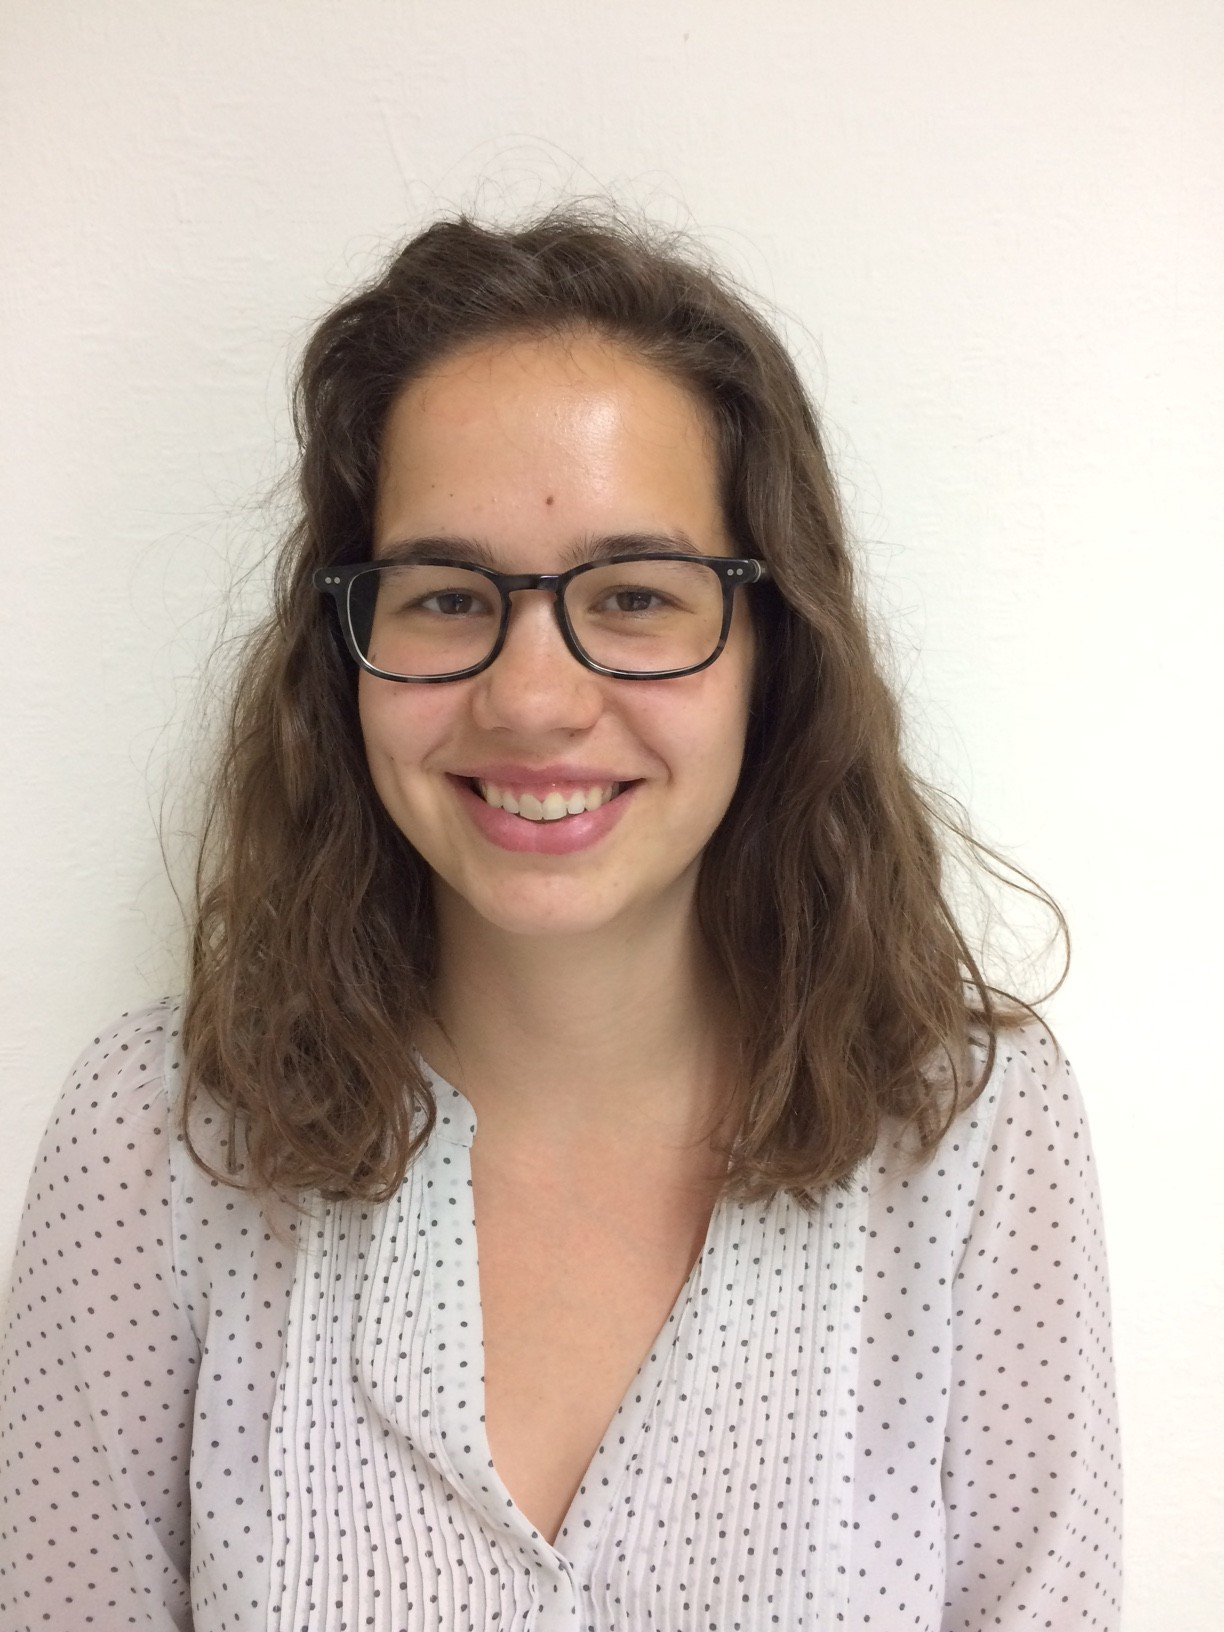 Louisa Gomes Munro